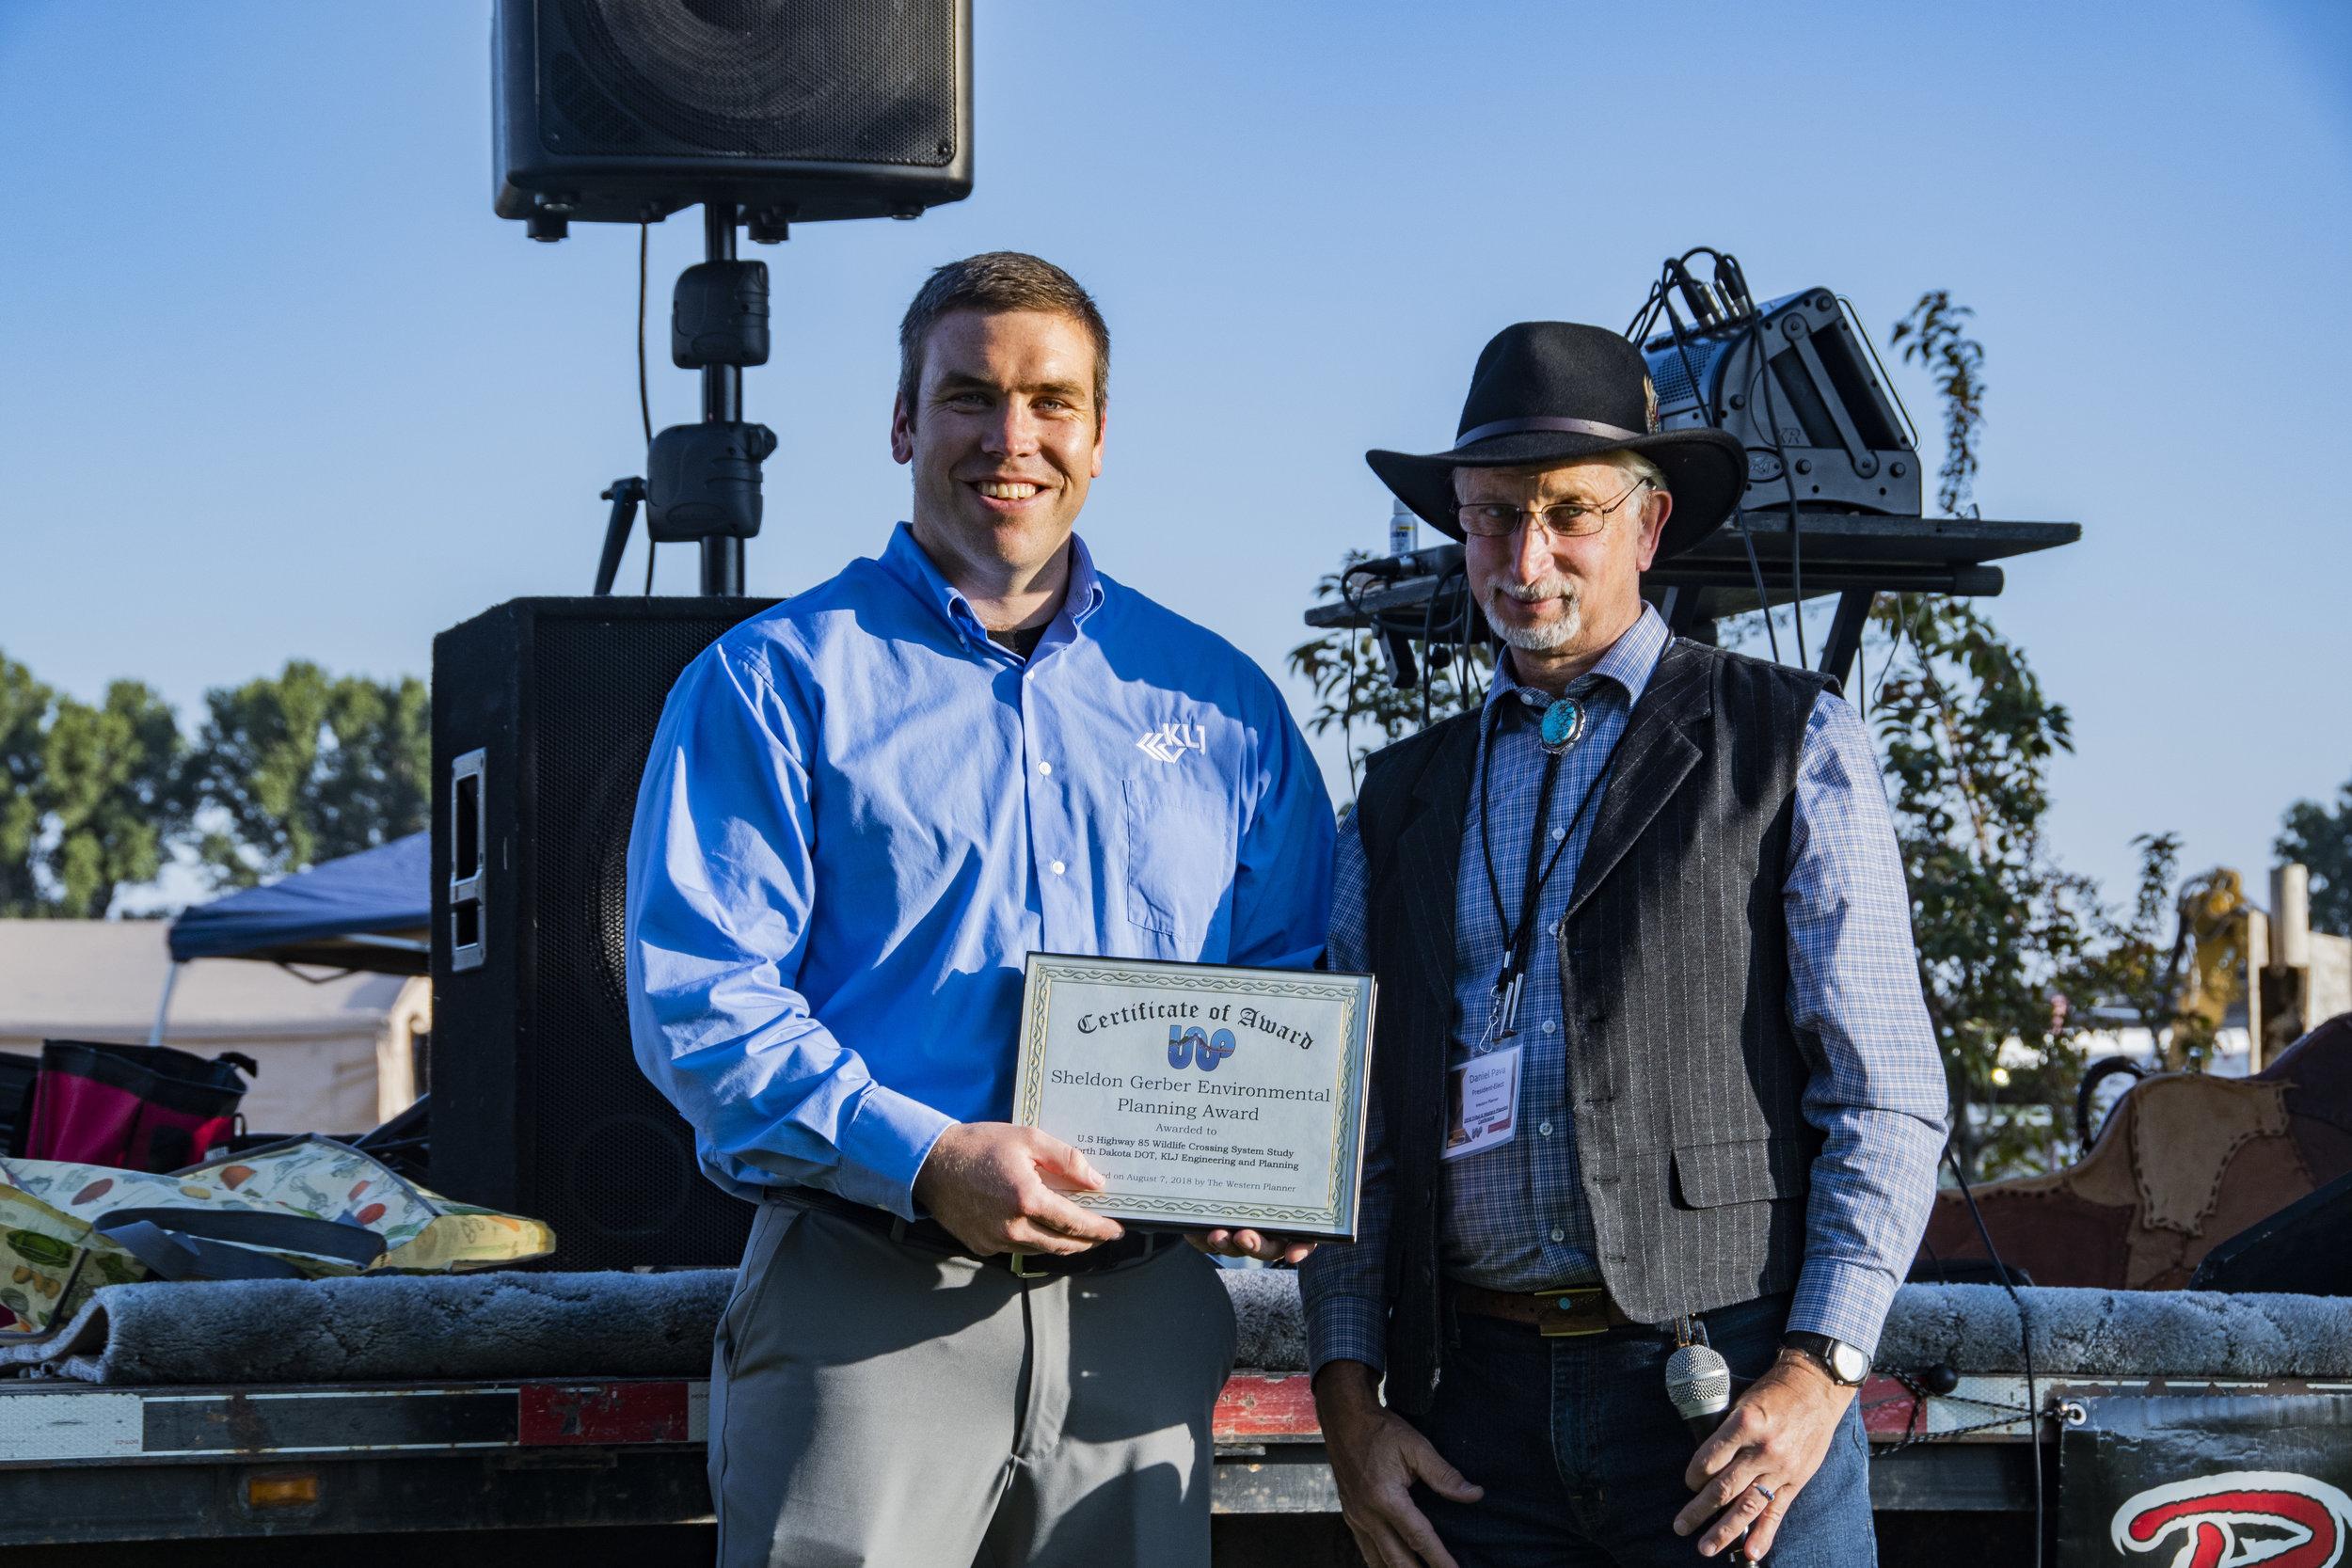 Luke LaLiberty accepted the award from Dan Pava, FAICP.